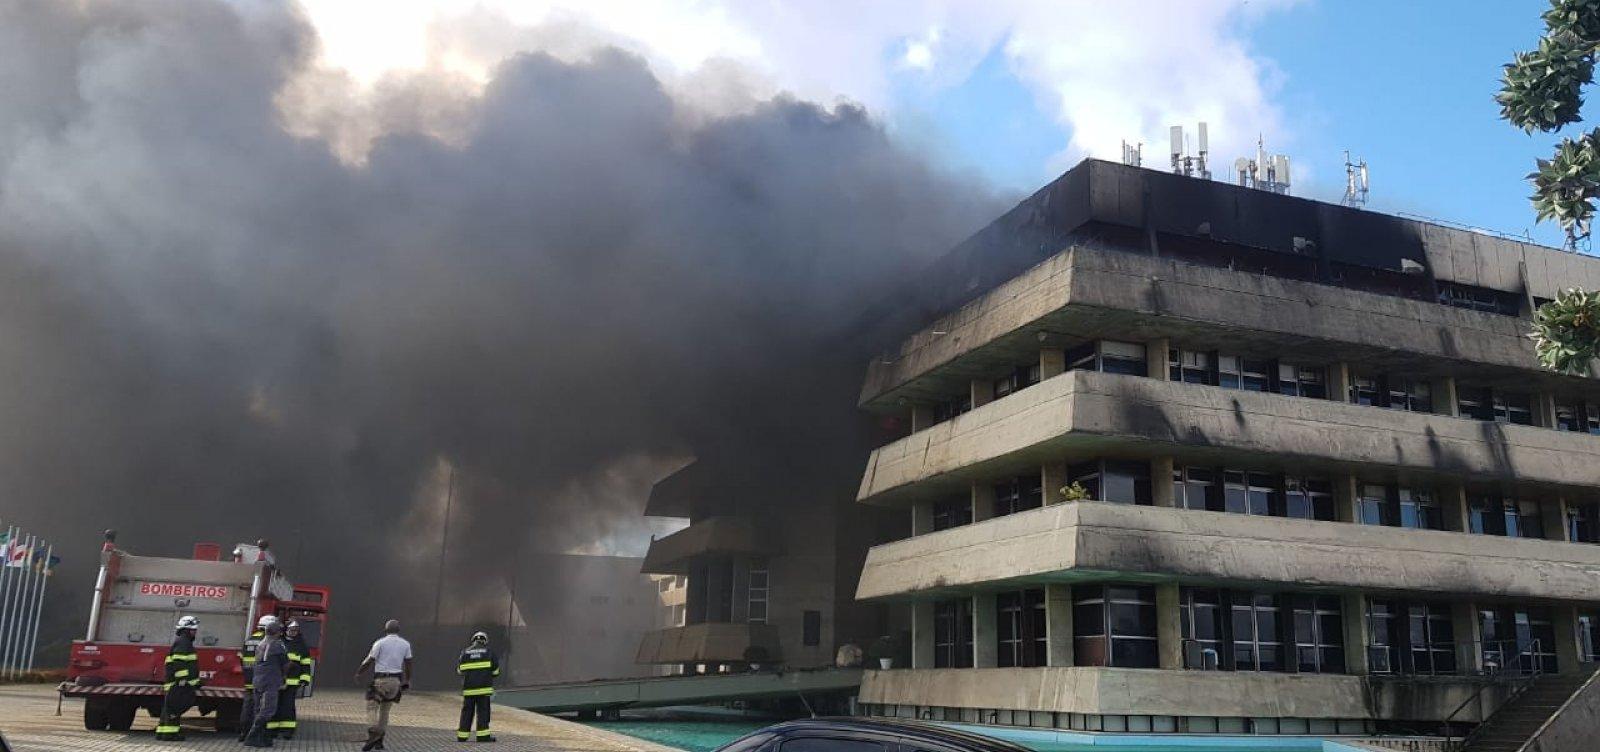 Incêndio atinge prédio da Assembleia Legislativa da Bahia